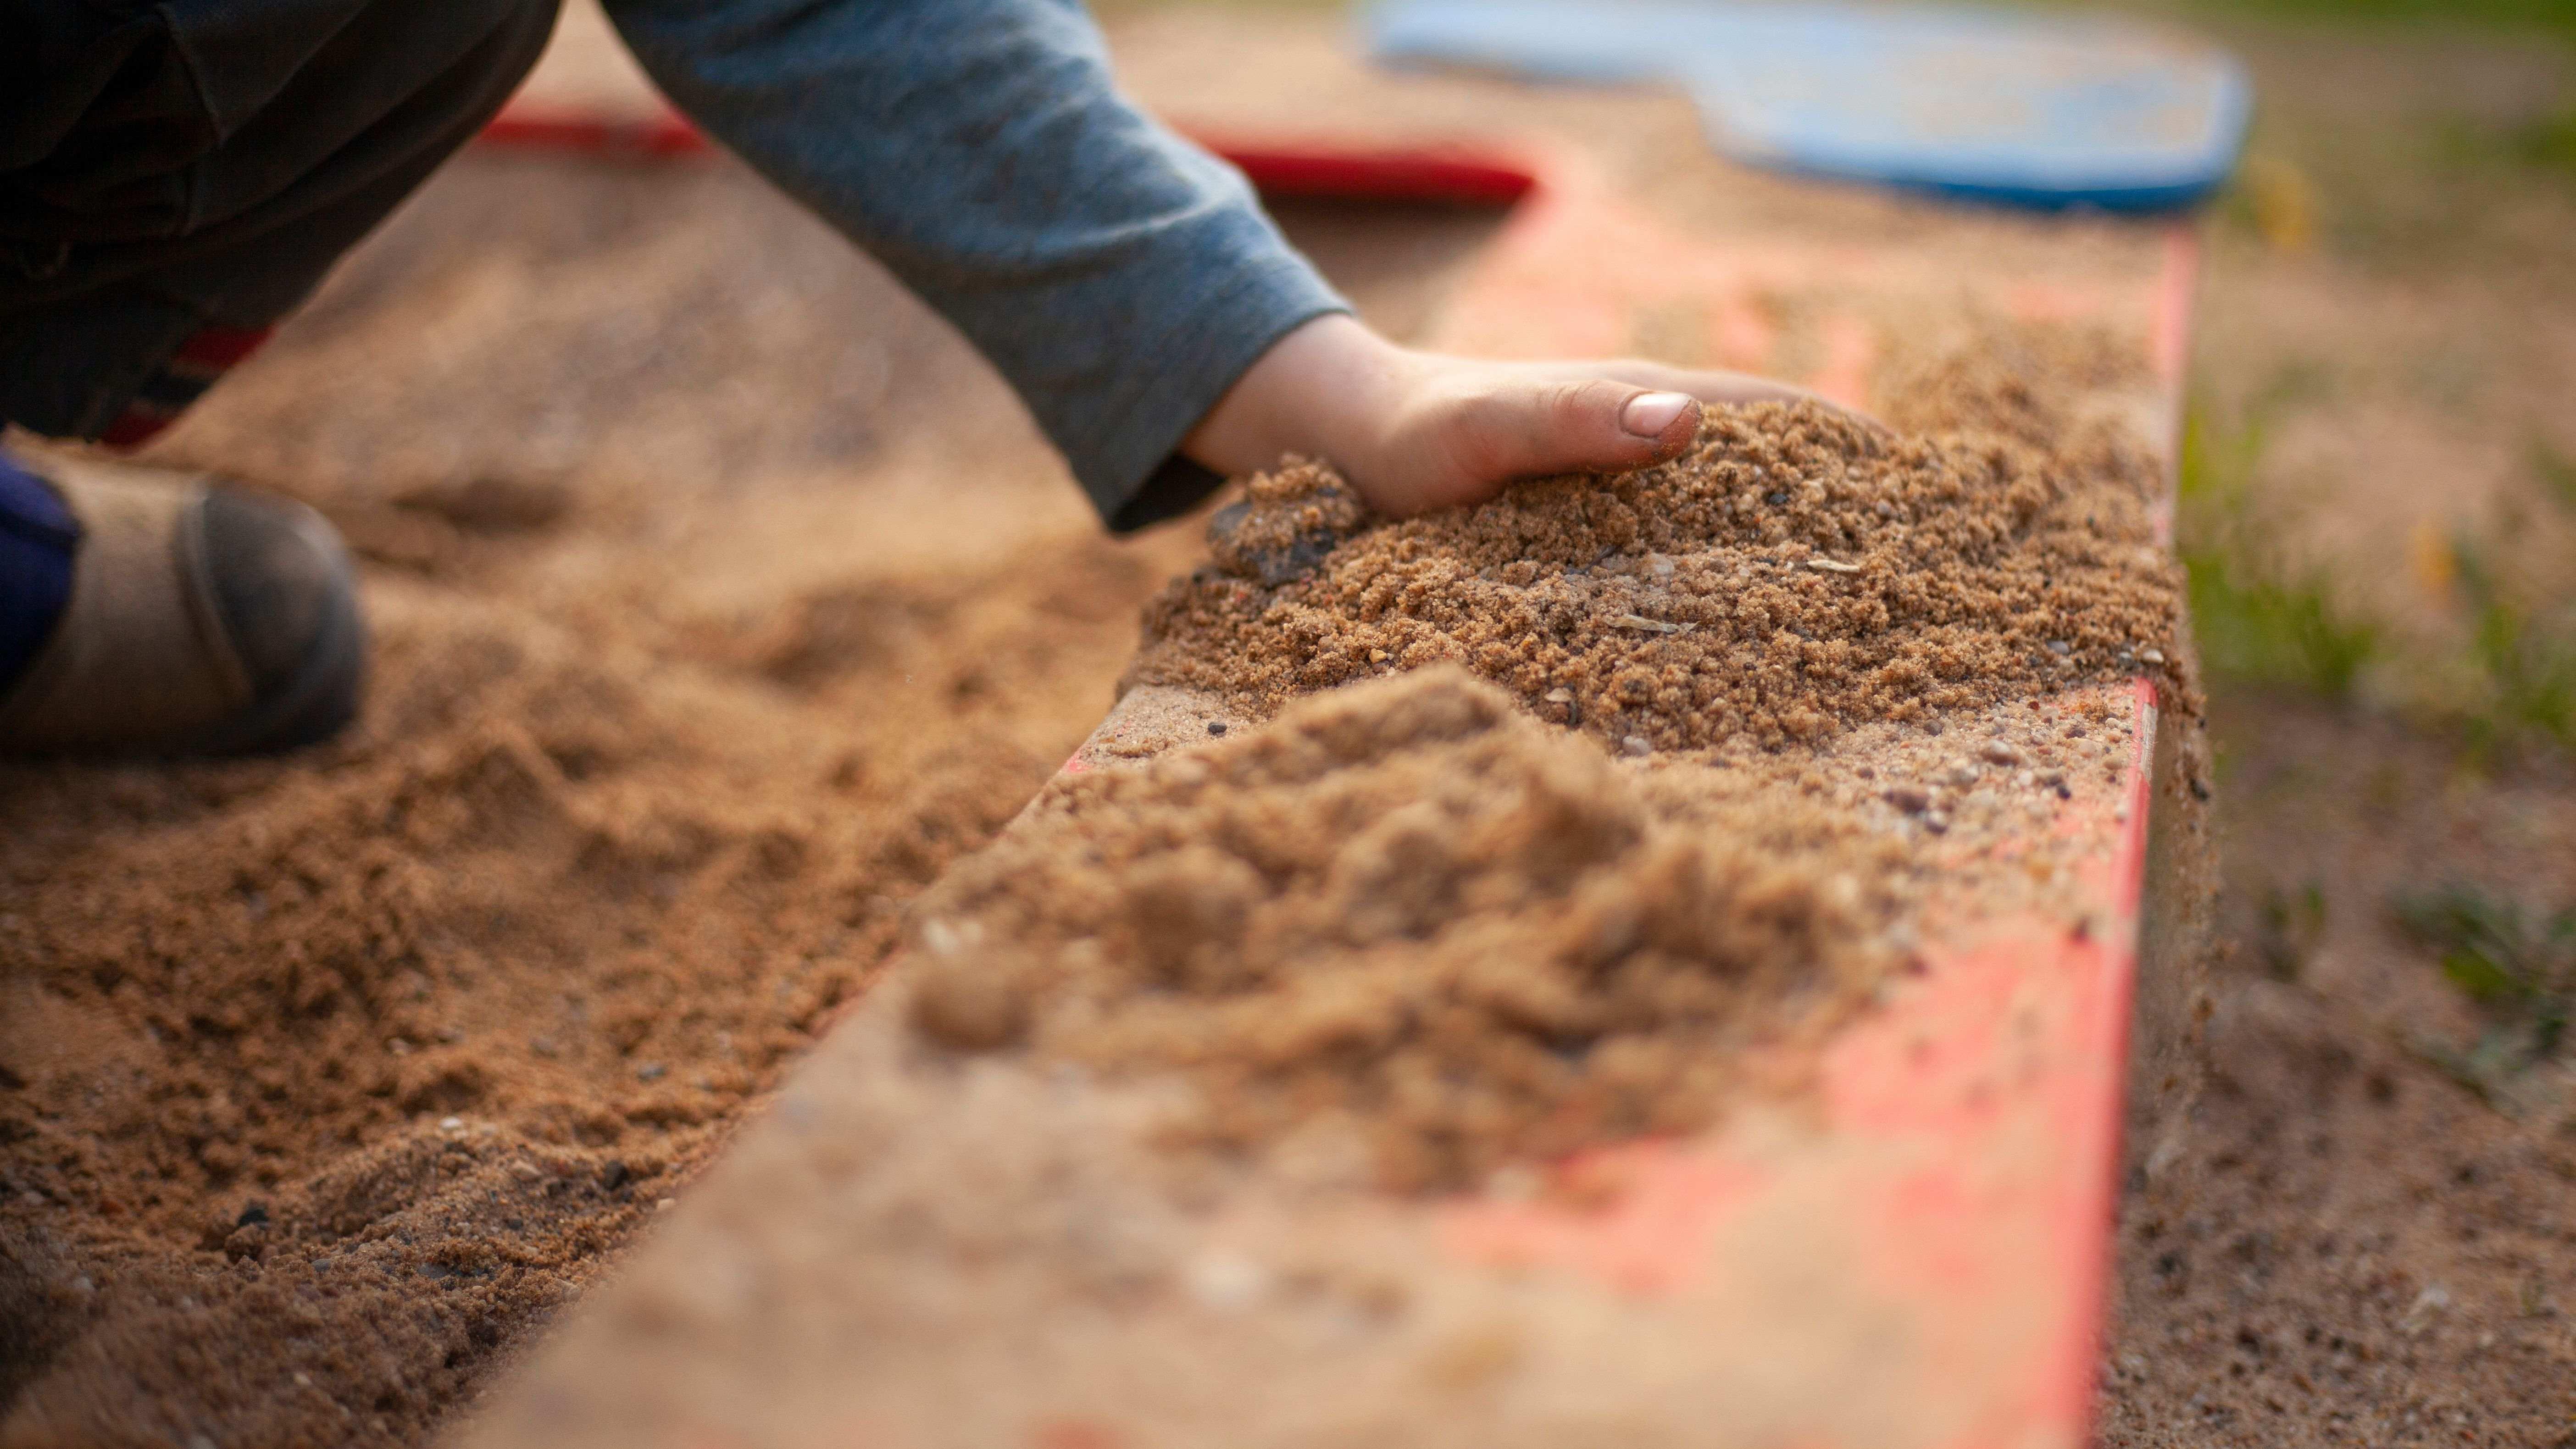 Sandpit buying guide